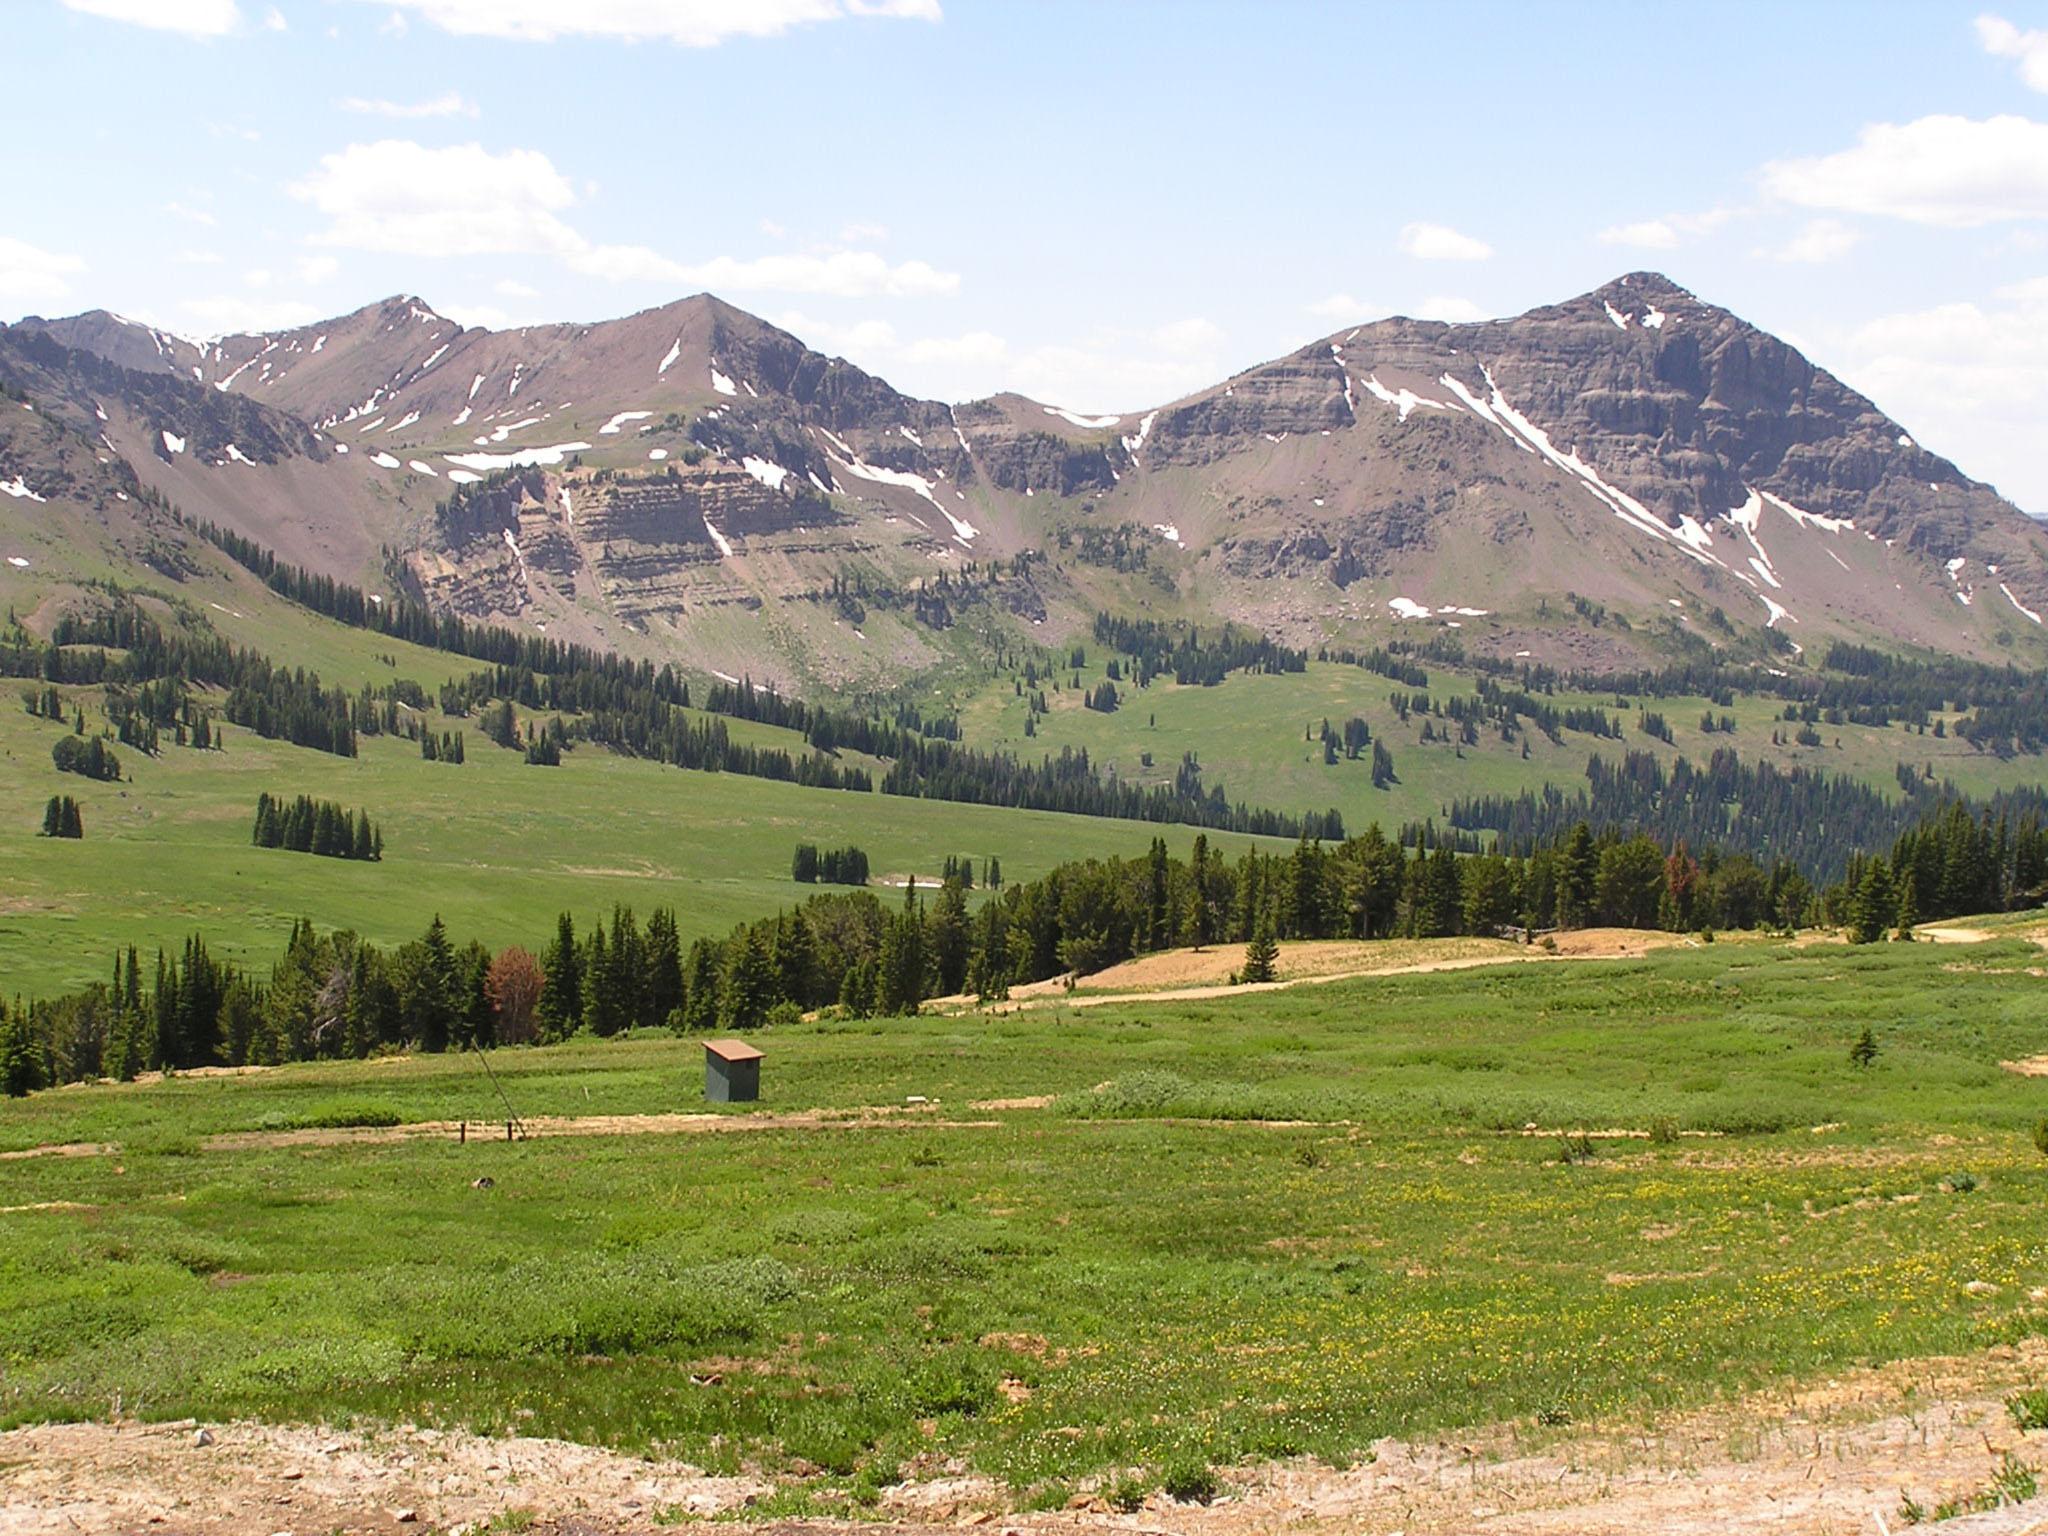 Gallatin National Forest. Photo credit: USDA, via flickr